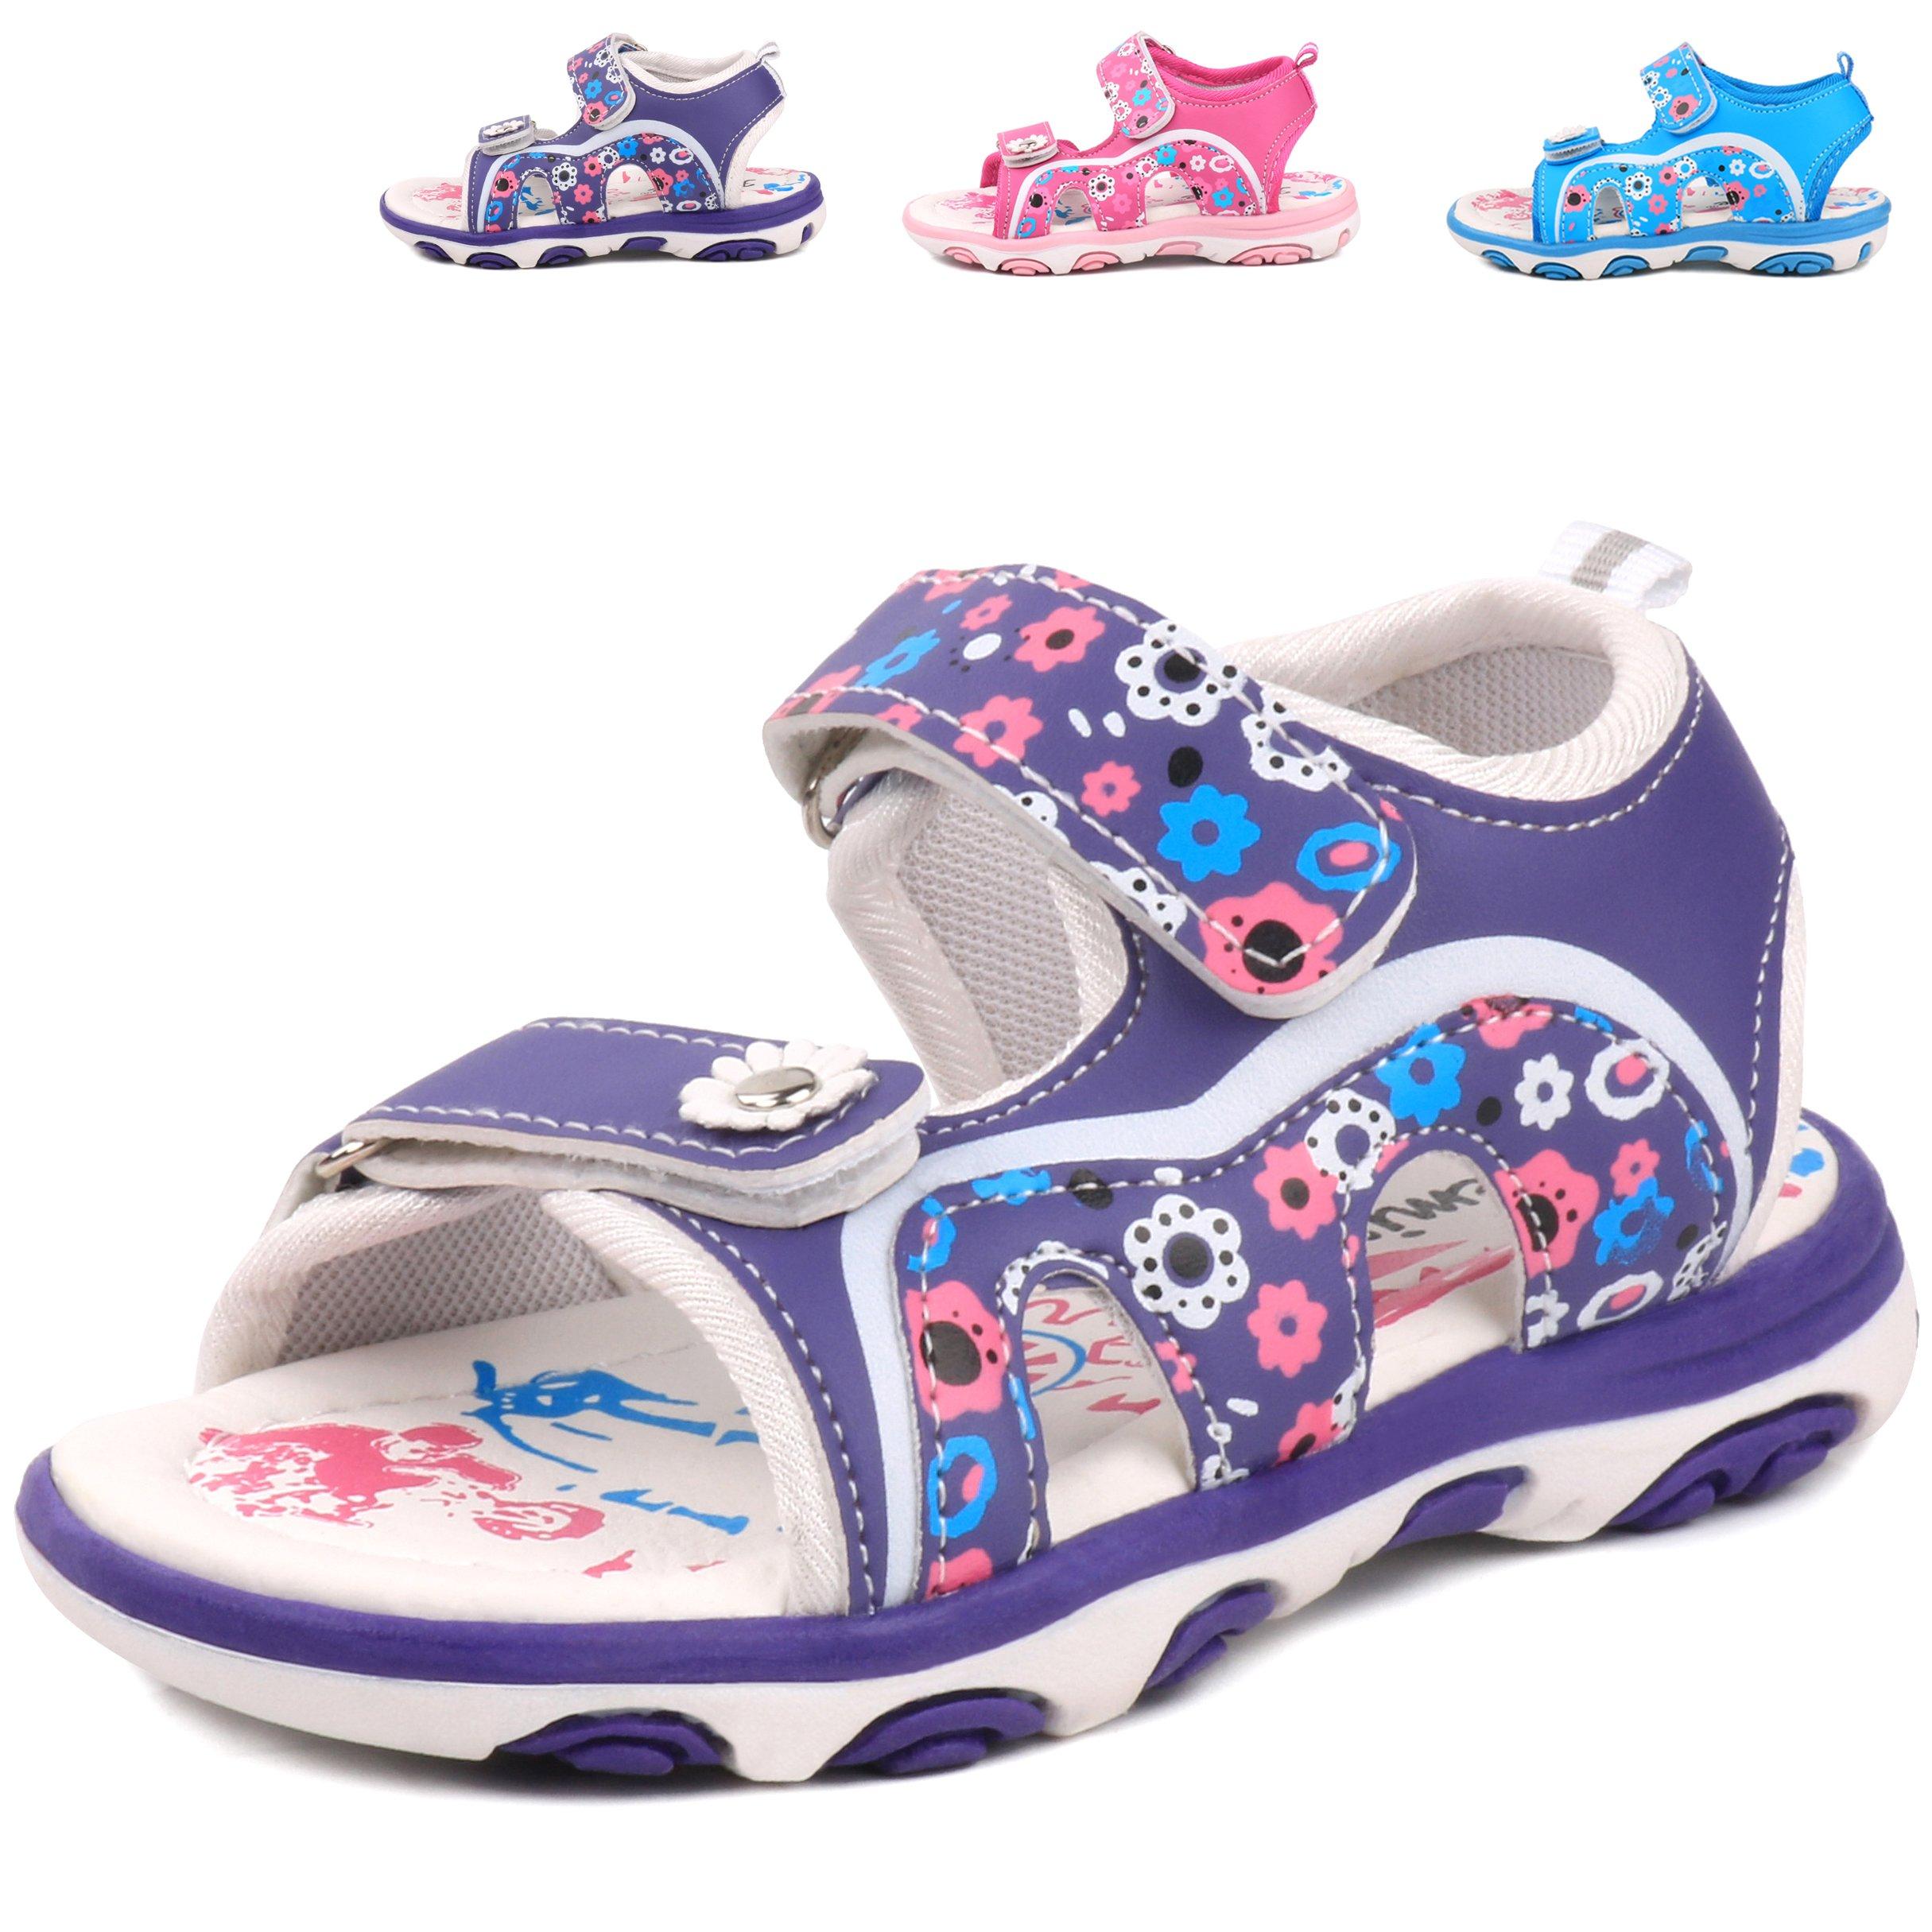 Femizee Girls Outdoor Summer Sandals,Purple,1541 CN28